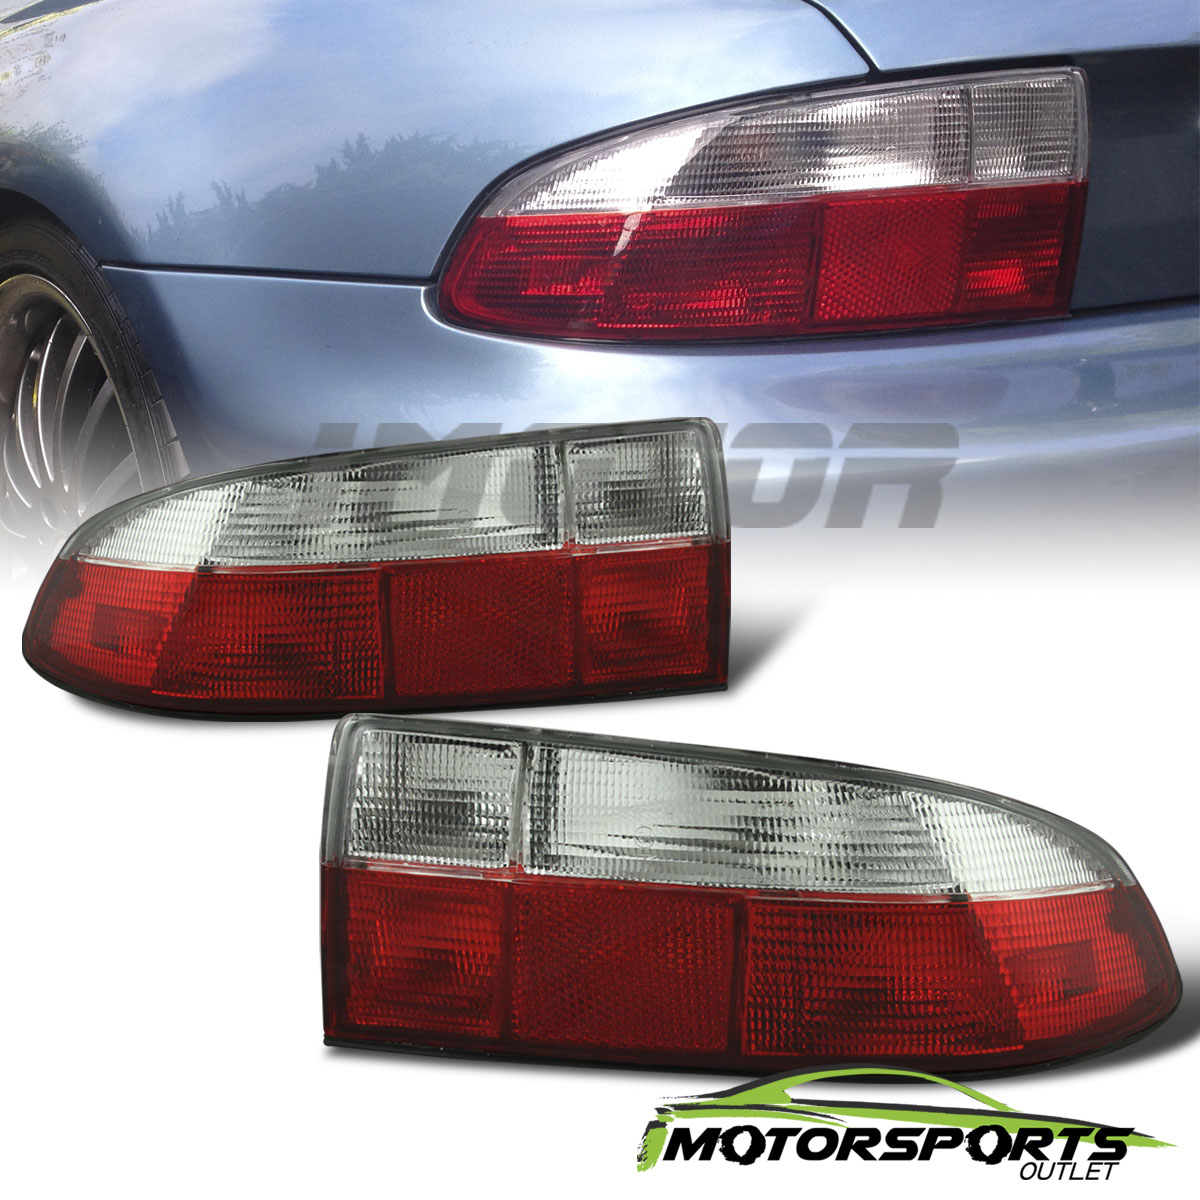 1996 Bmw Z3 For Sale: [Factory Style] 1996 1997 1998 1999 BMW E36/7 E36/8 Z3